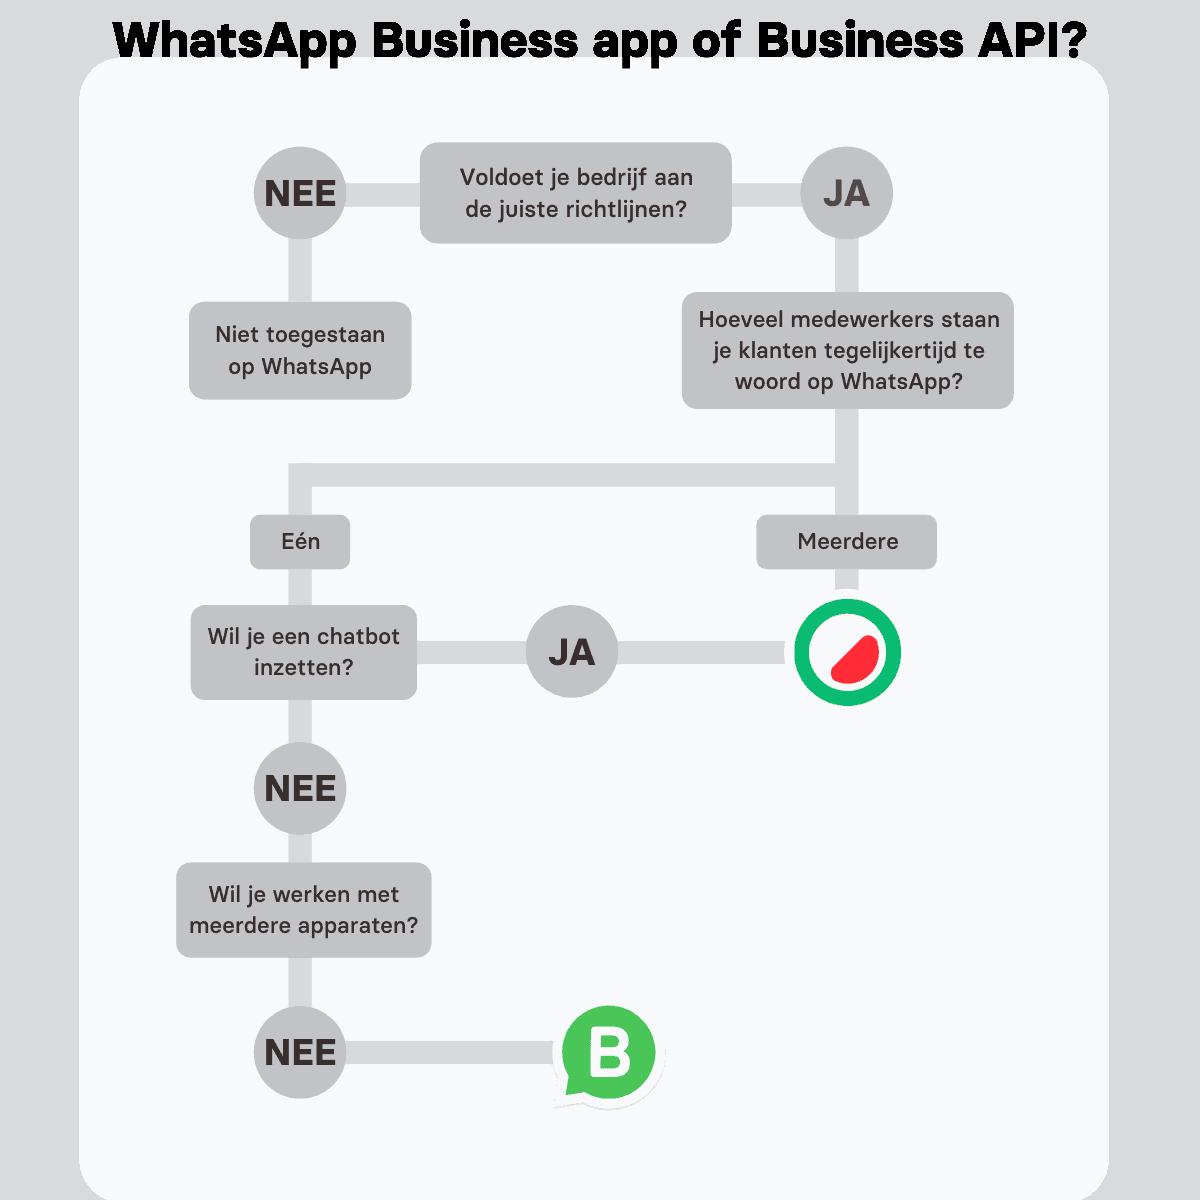 WhatsApp business app of business API